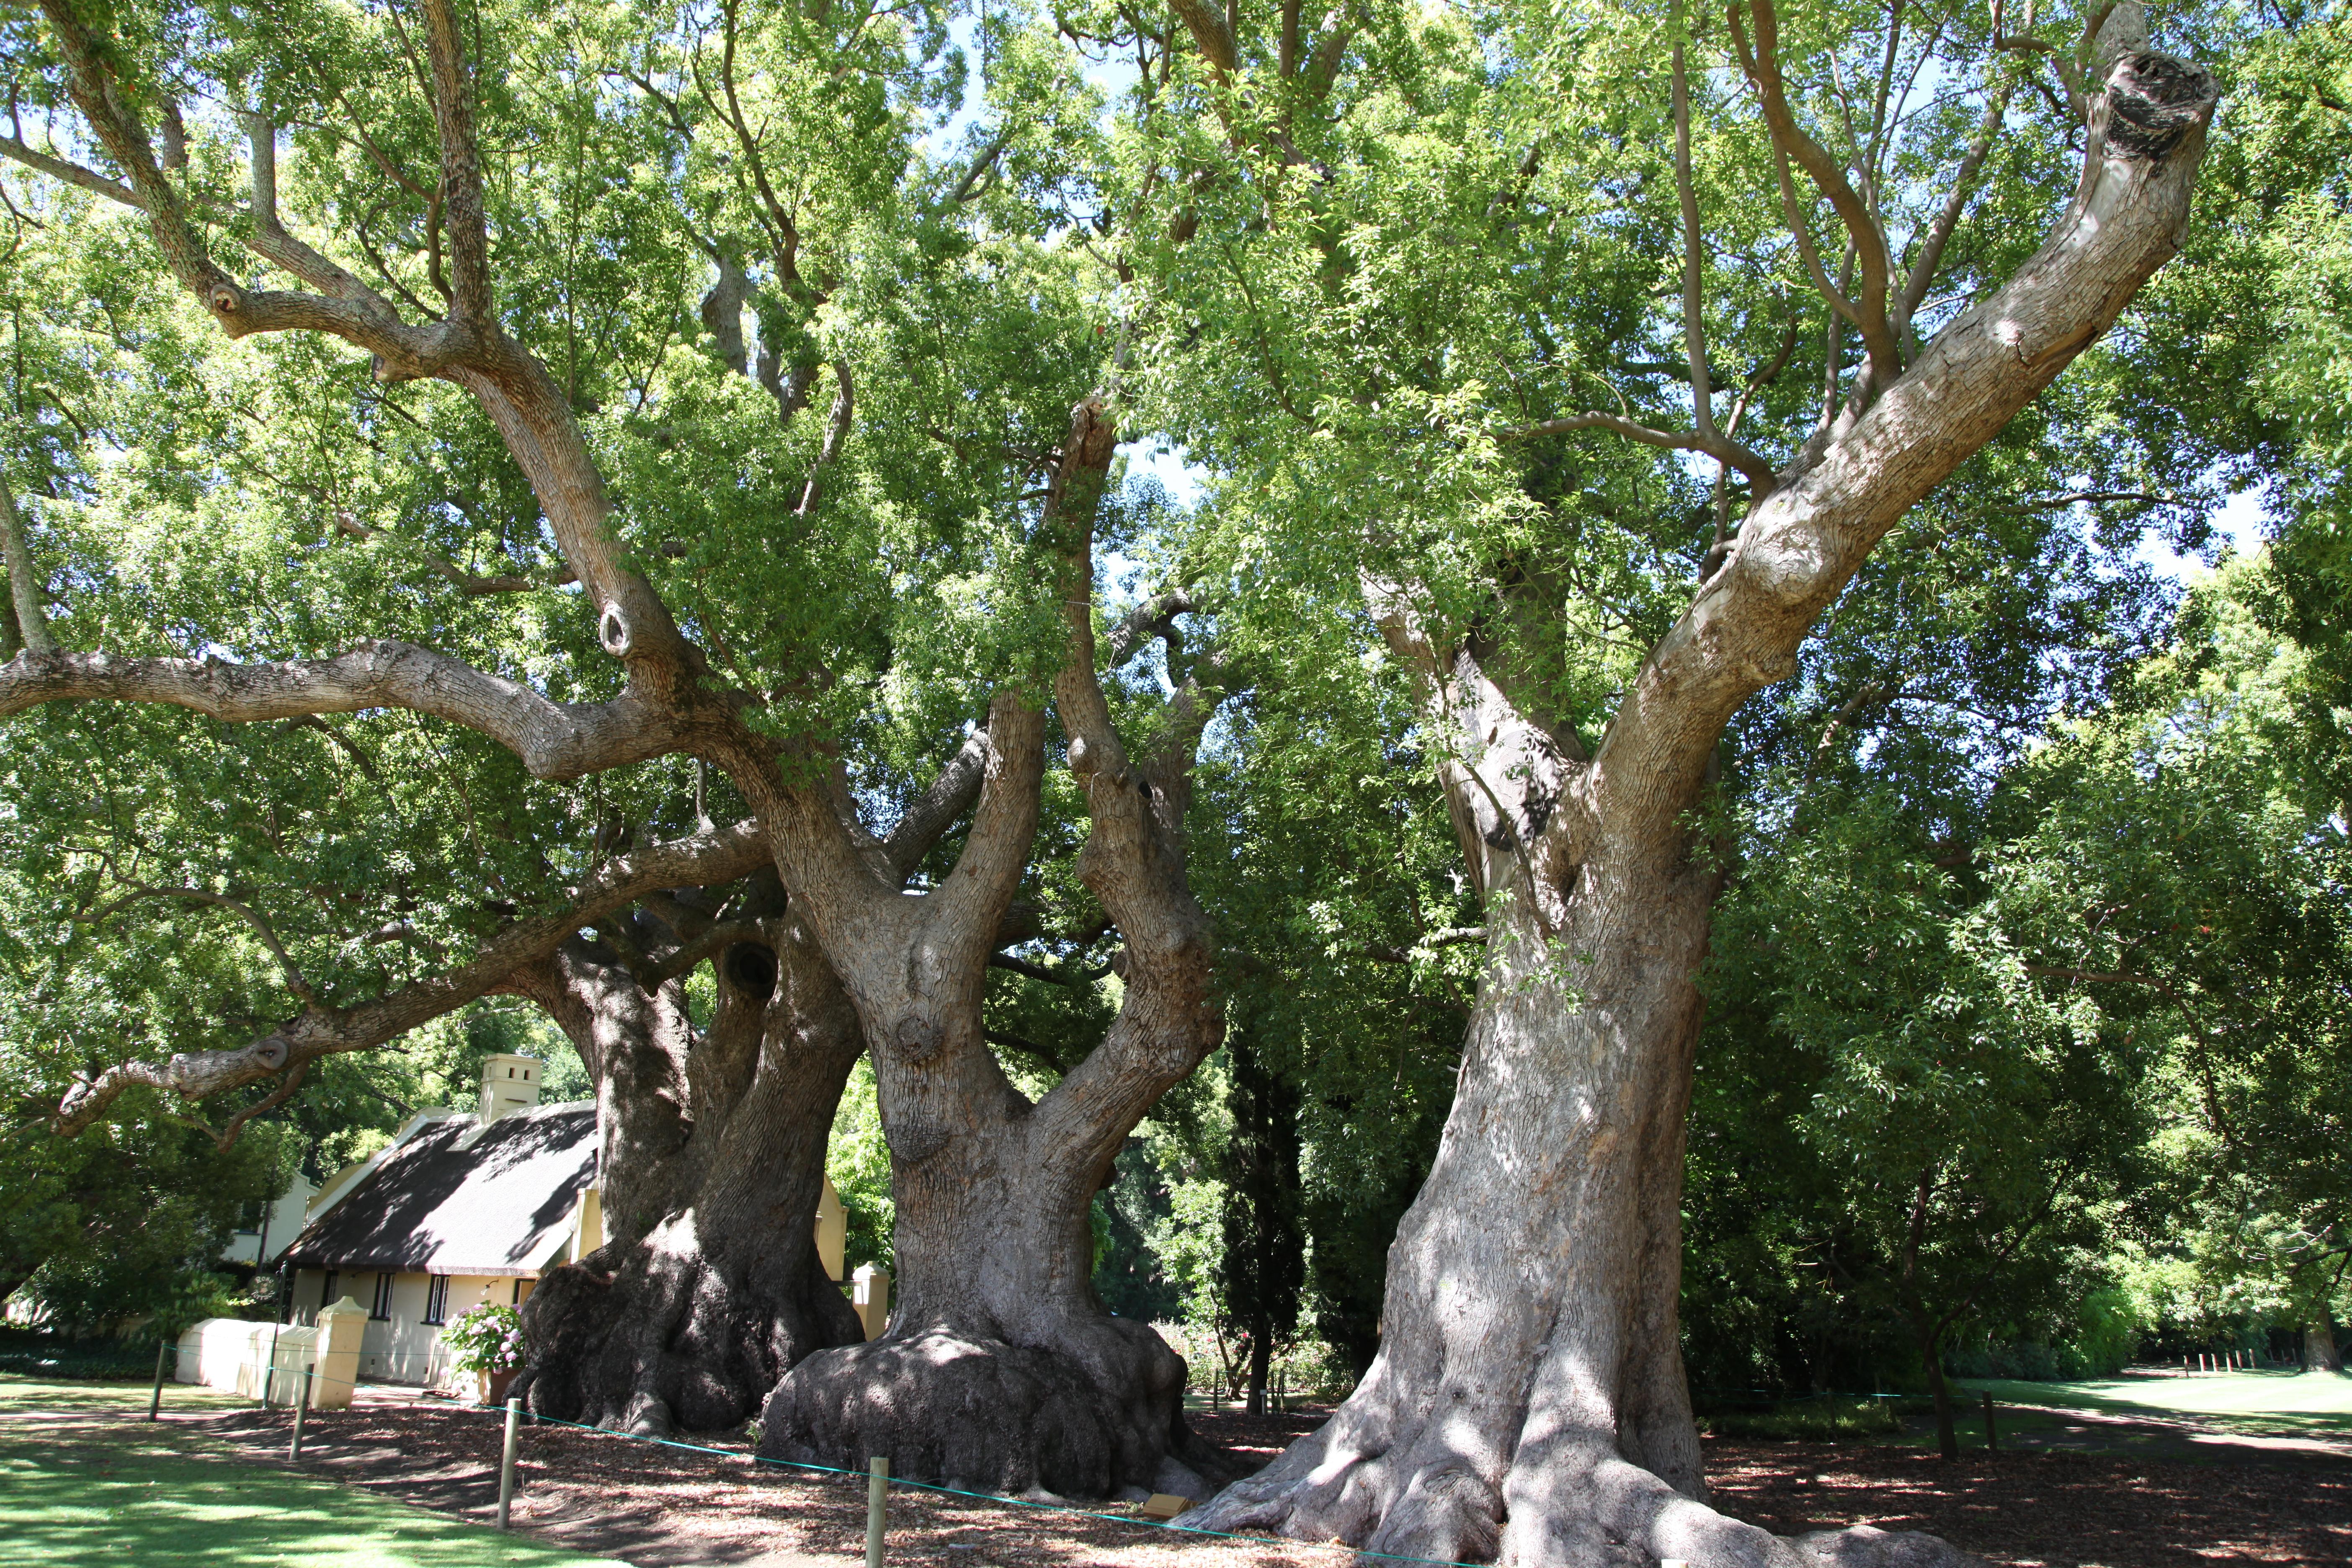 File:Camphor trees at Vergelegen JPG - Wikimedia Commons